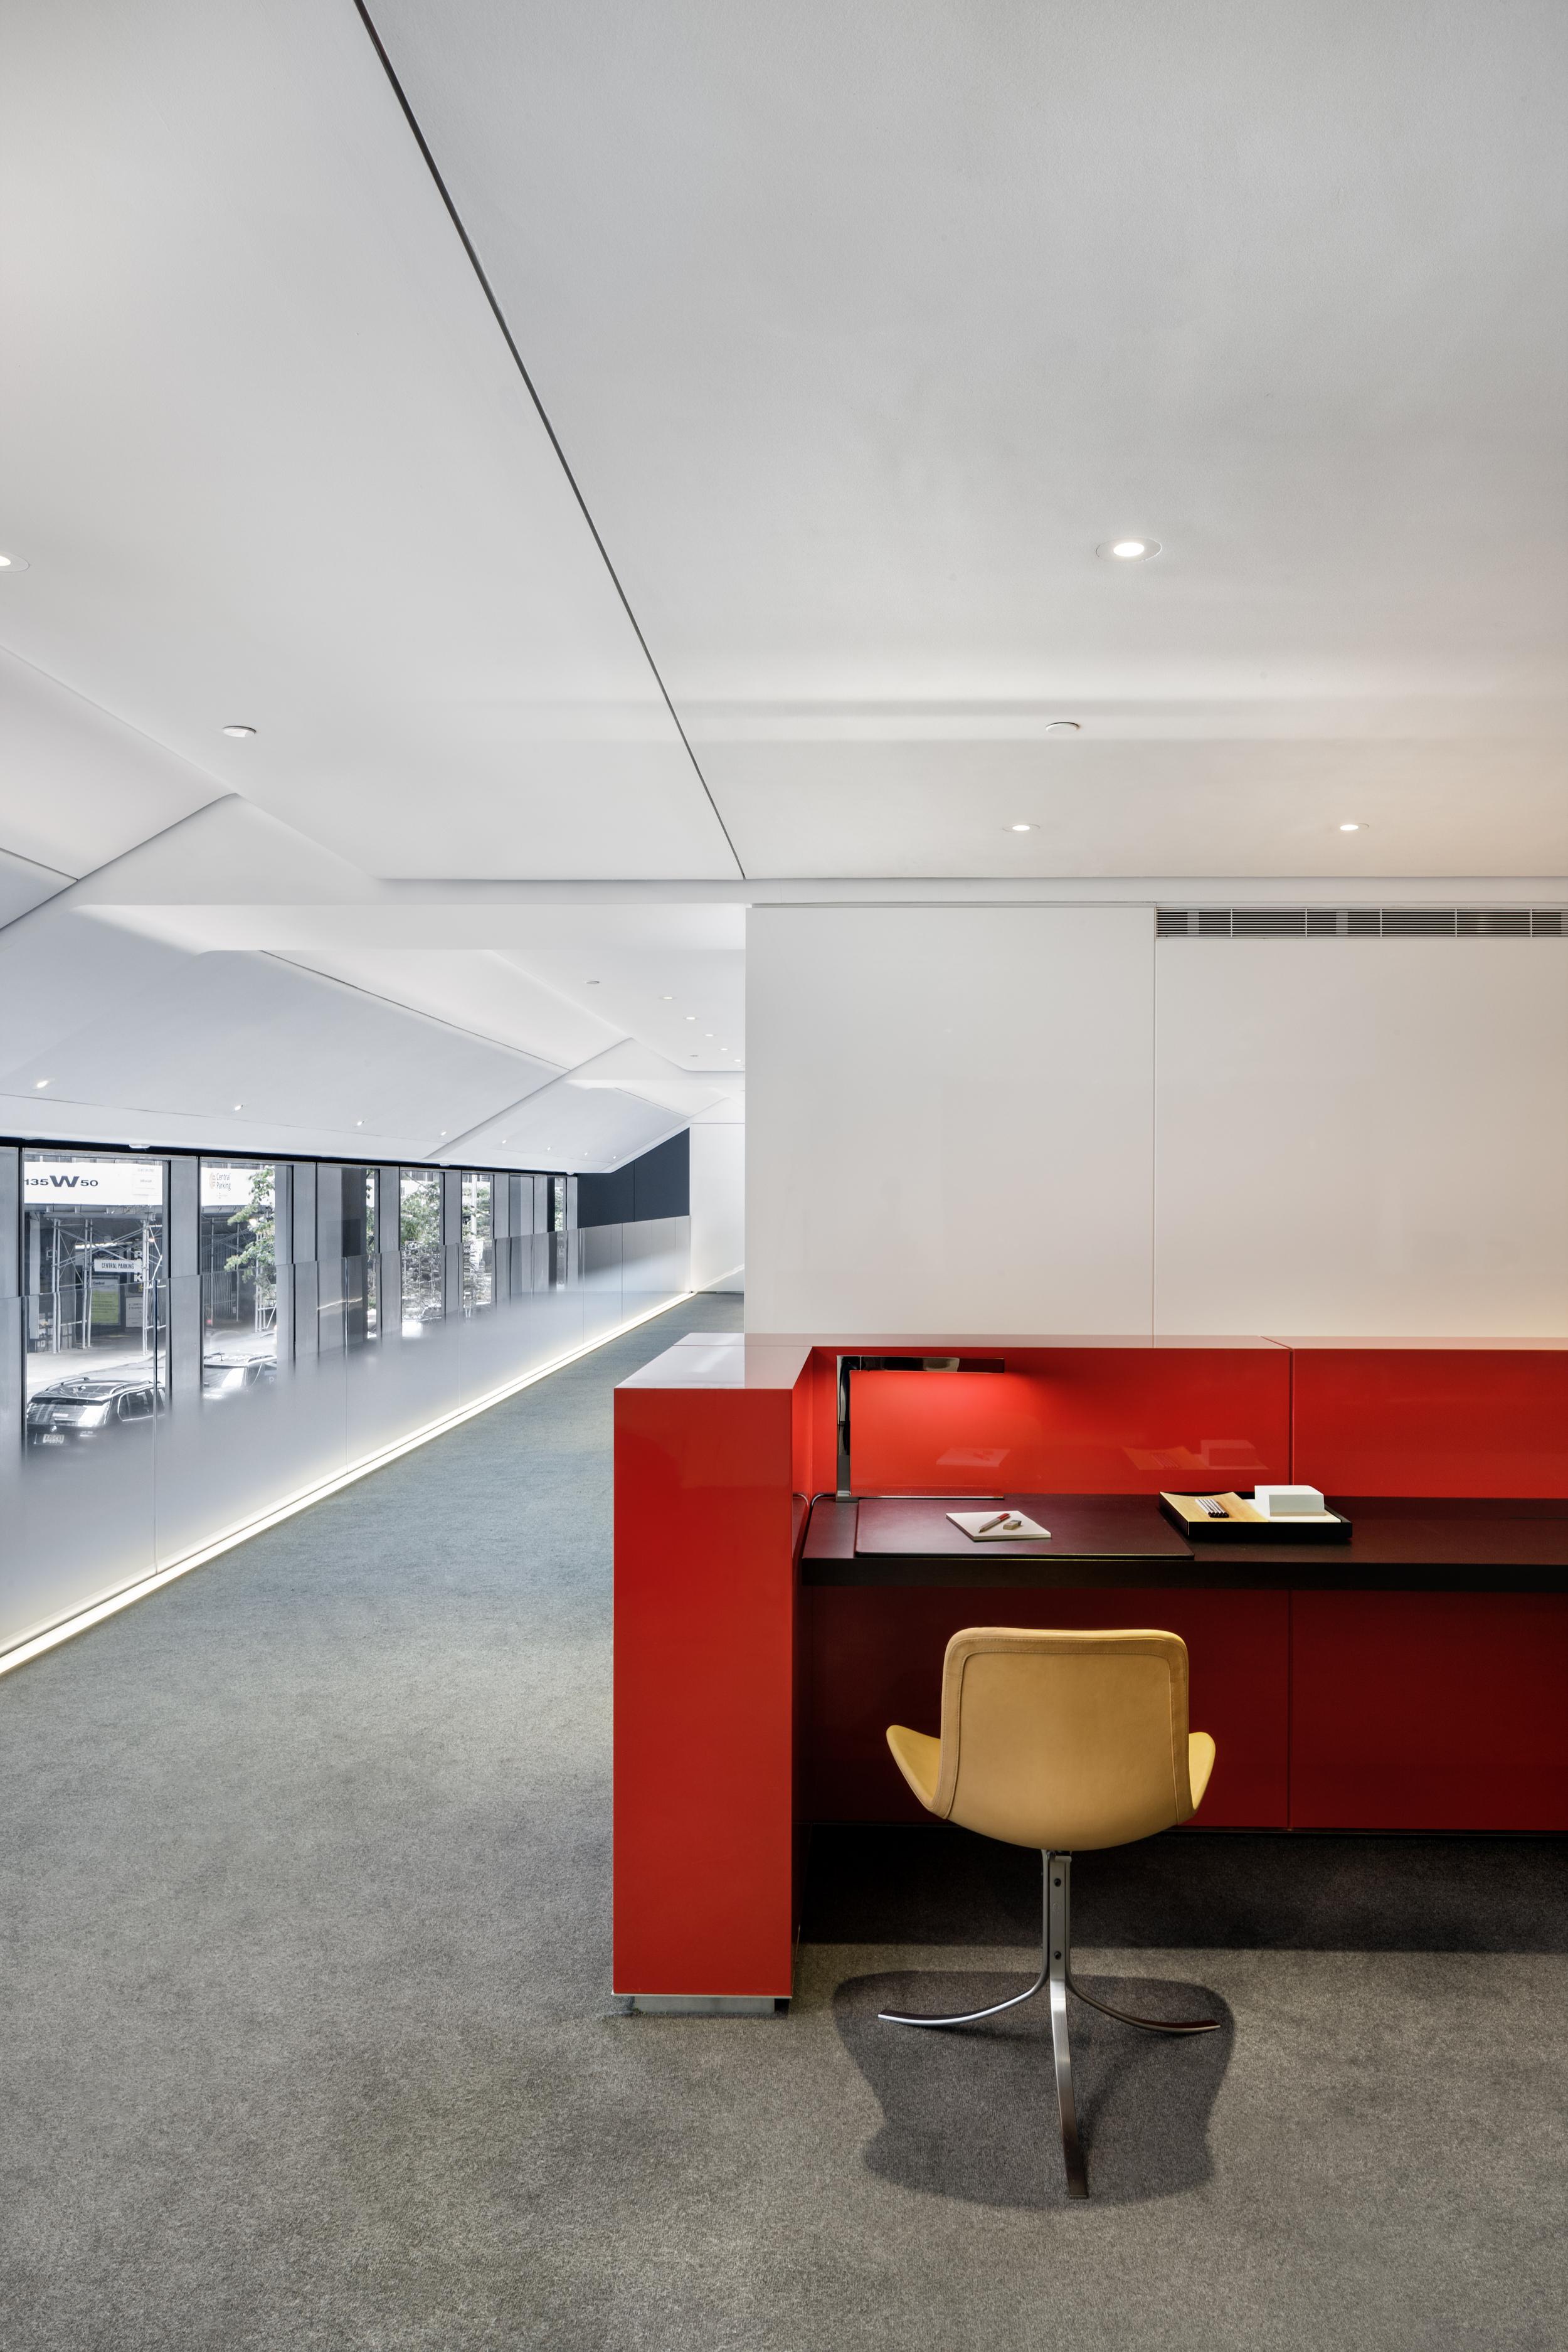 HIPNY_UBS Welcome Center_20140920_10.jpg